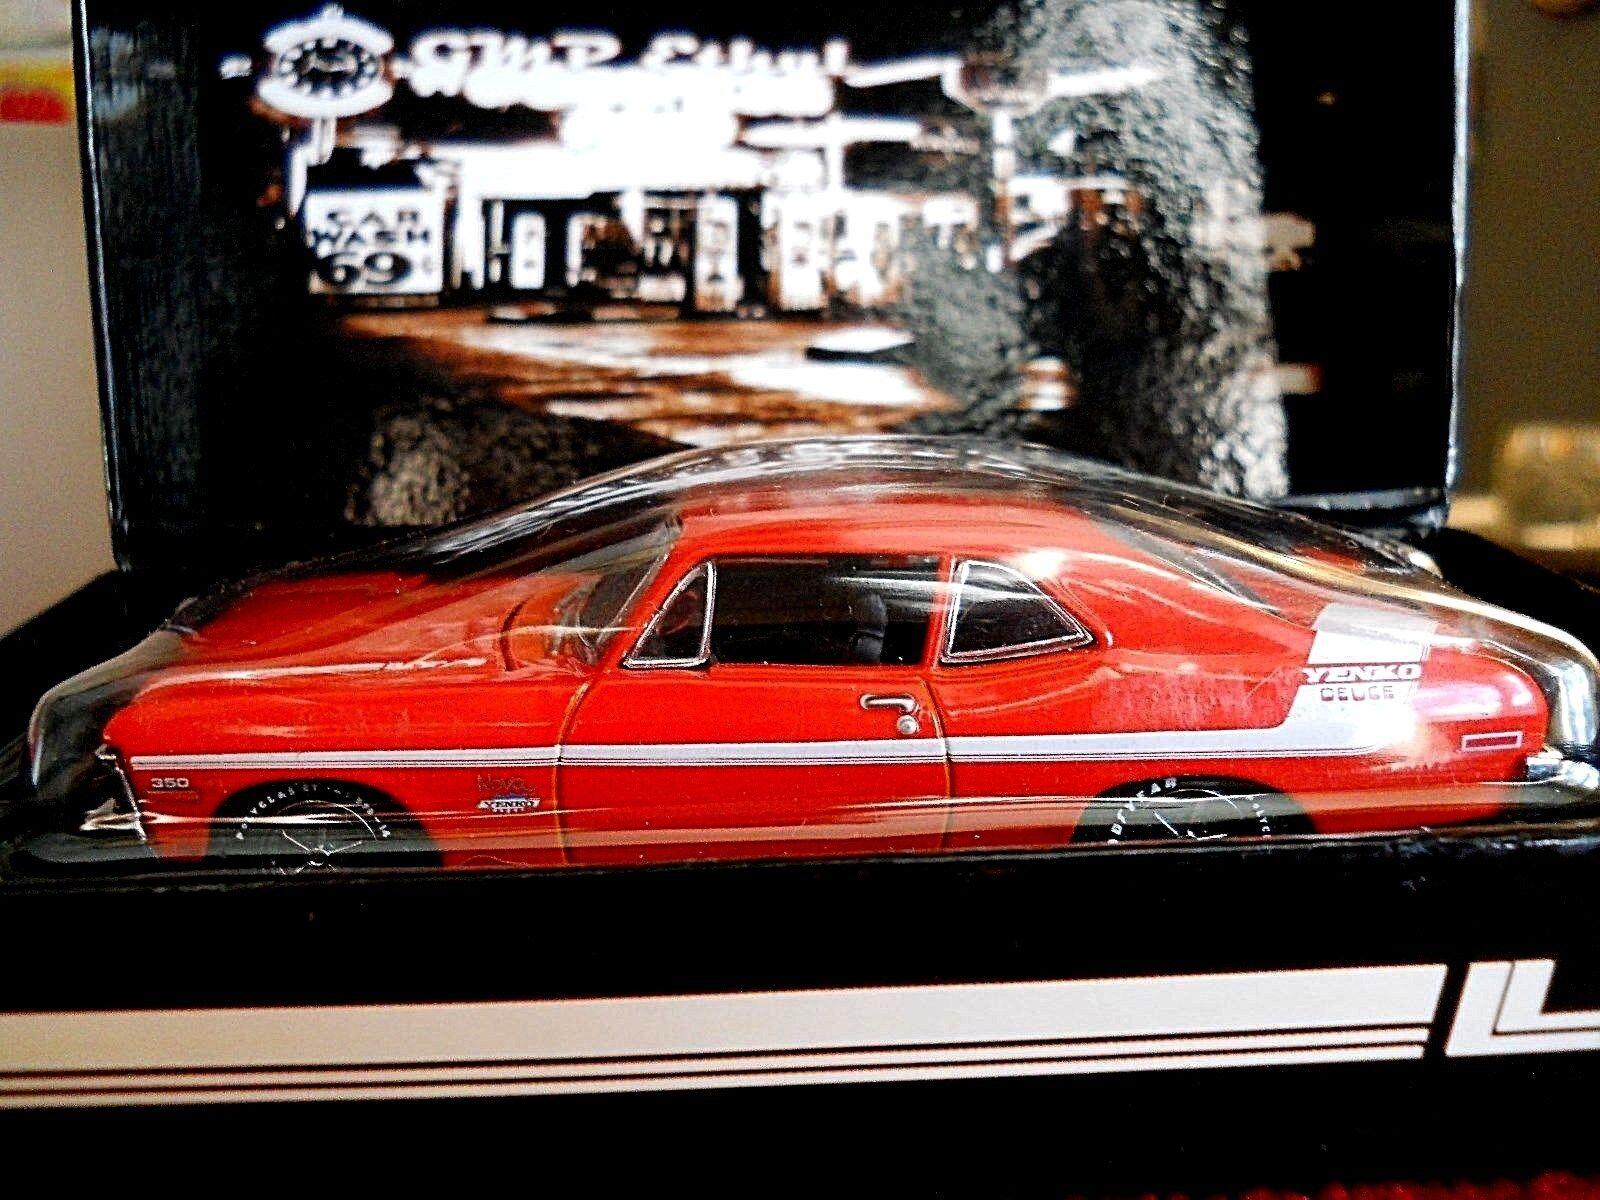 GMP 1970 1970 1970 Yenko Deuce Chevrolet Nova LT 350, arancia Chevy 1:43 SCALE 21da2c